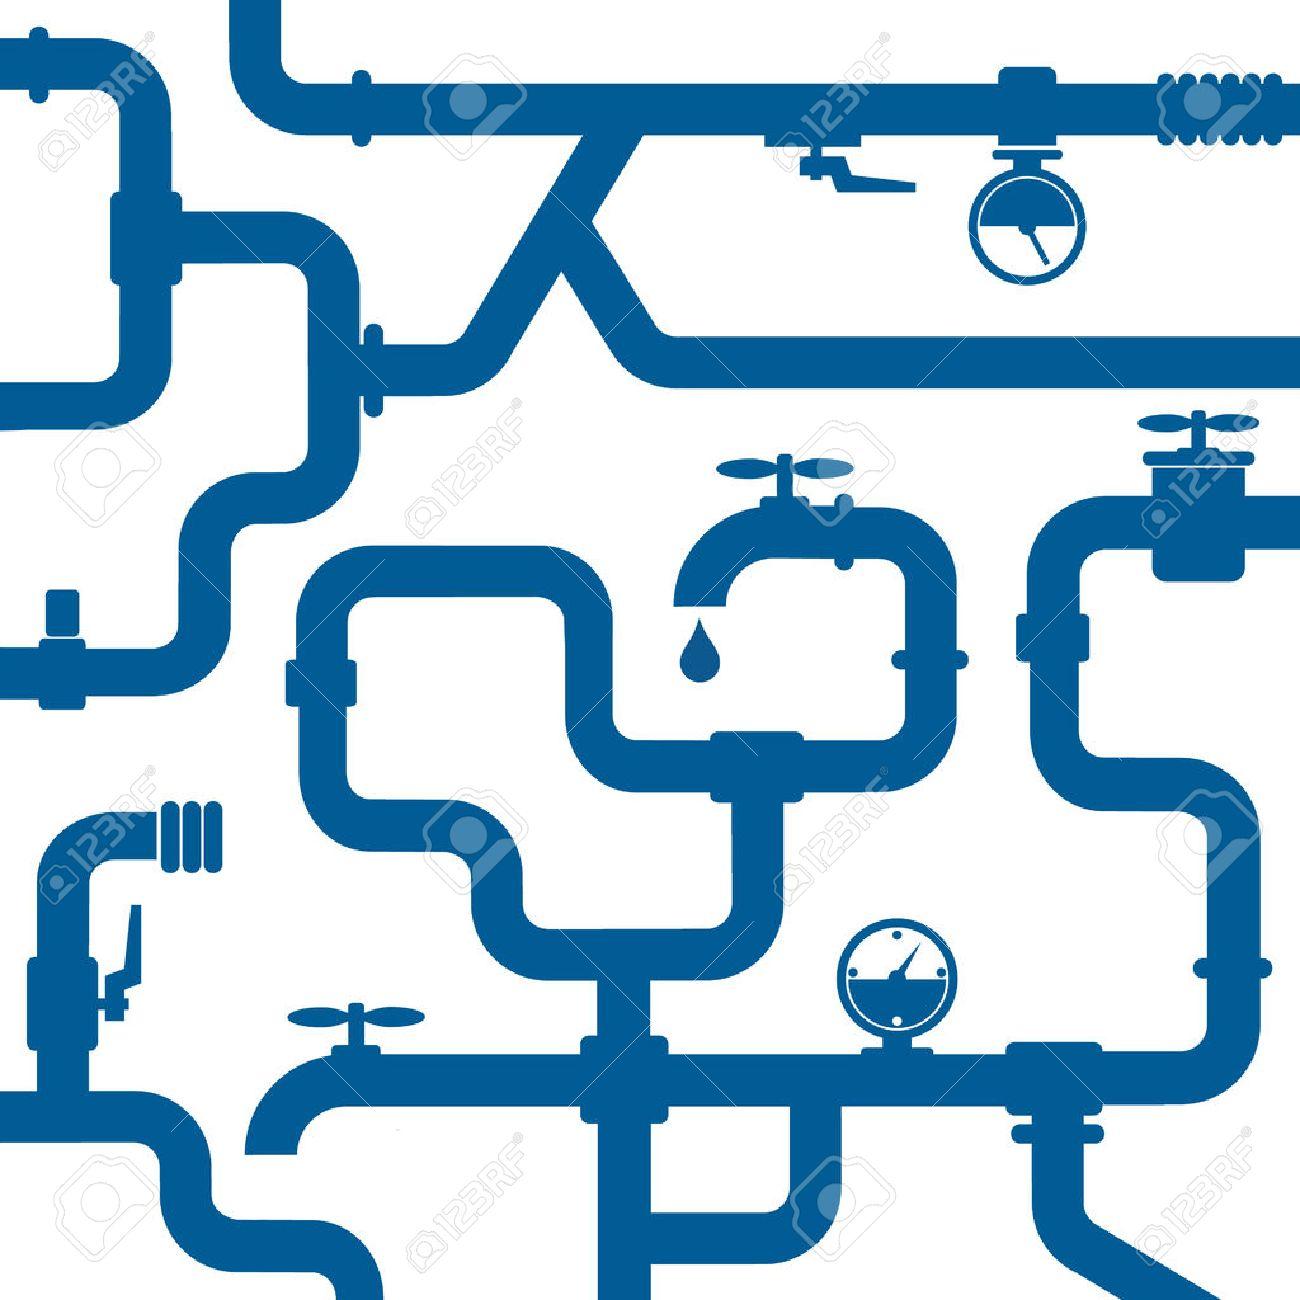 background of plumbing and taps, repair - 28524283